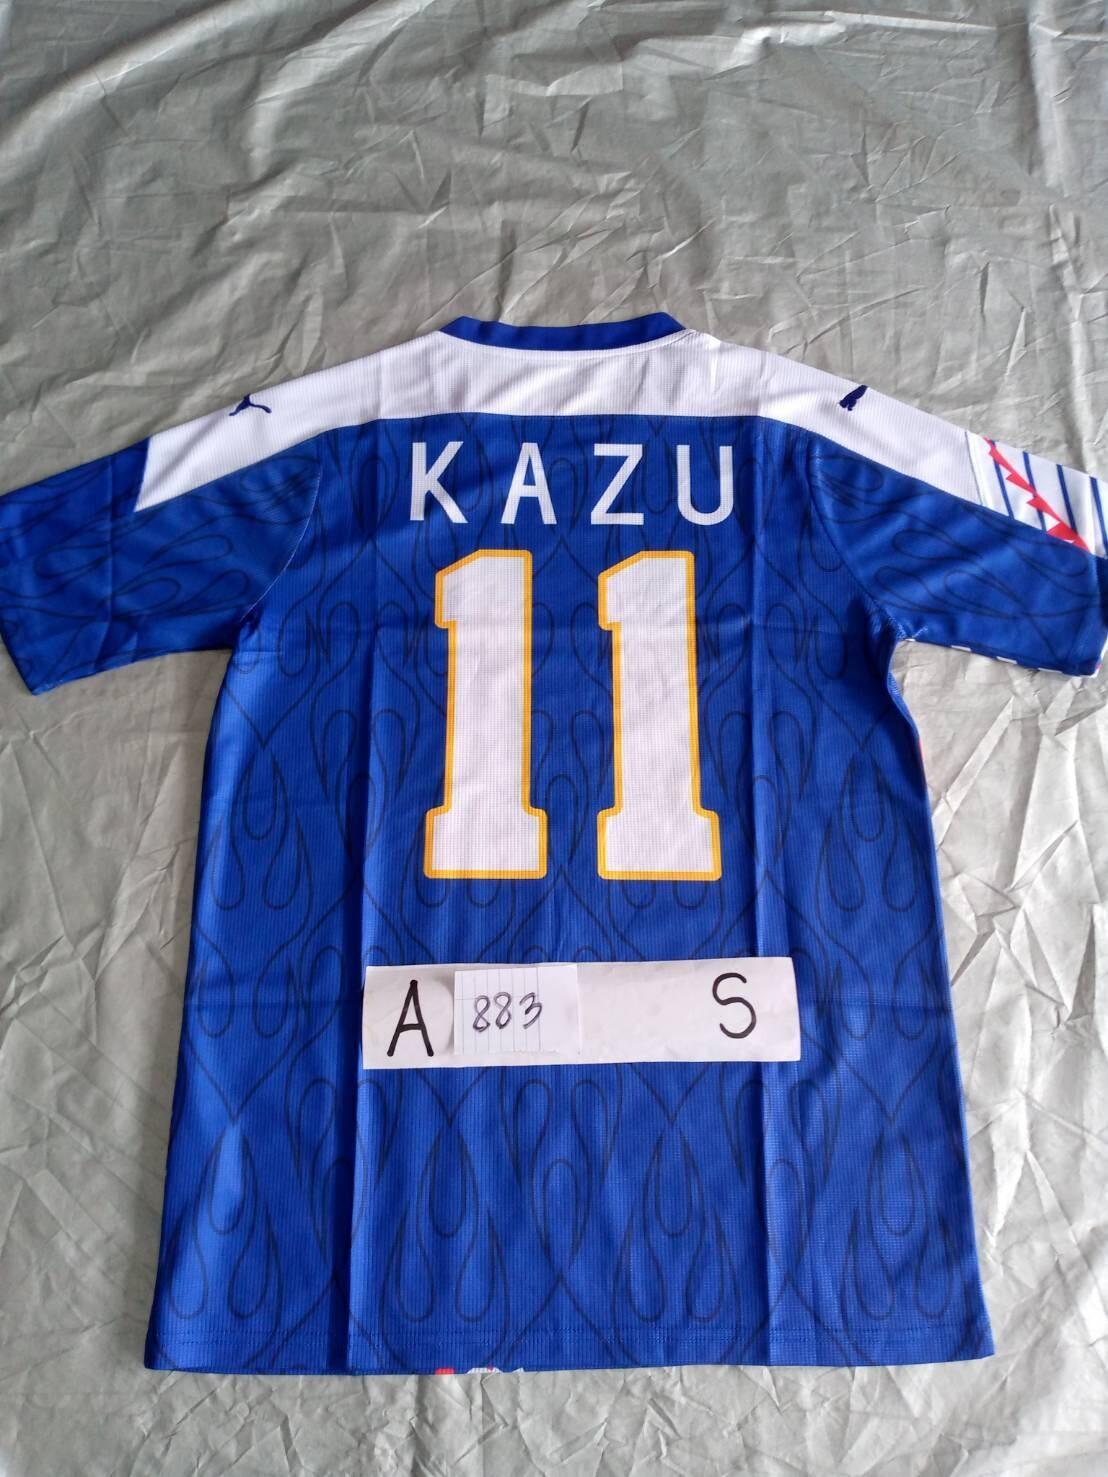 883 GIAPPONE MAGLIA CASA JERSEY HOME JAPAN KAZU 11 TAGLIA S SIZE S